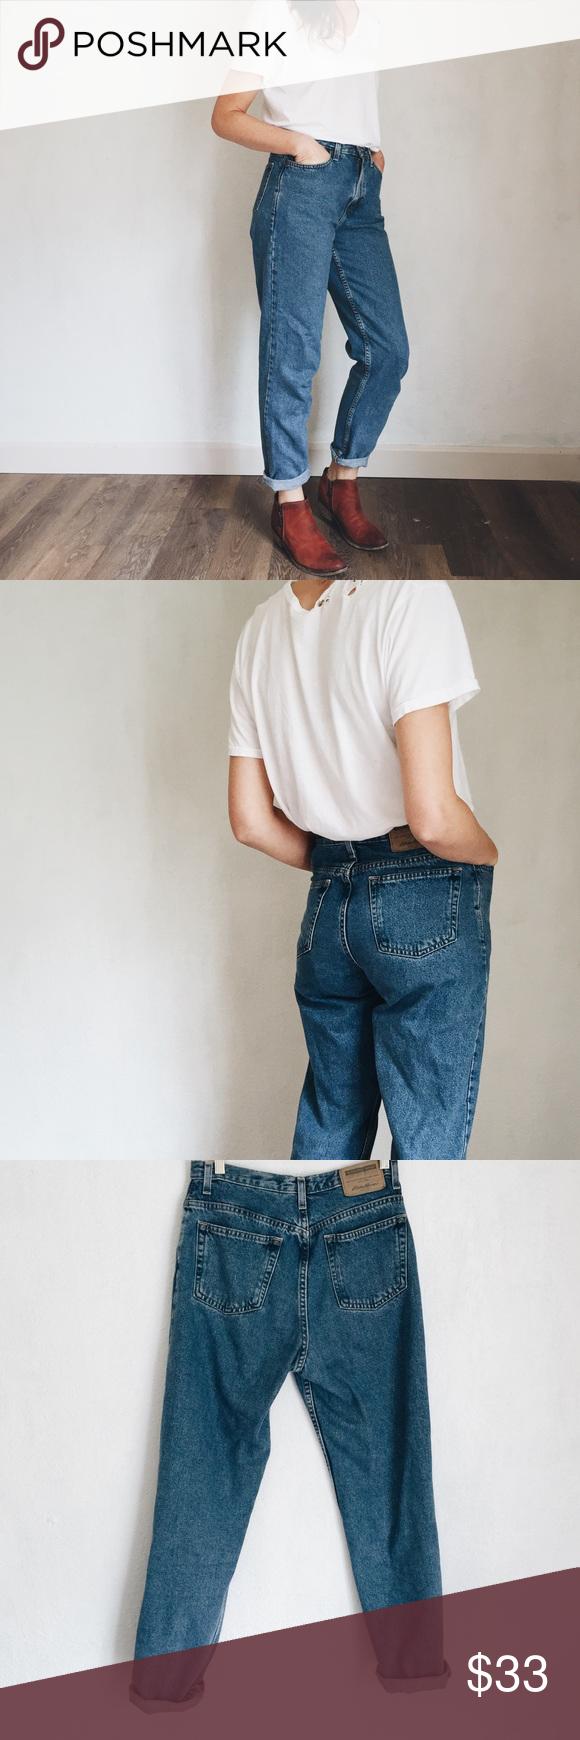 Vintage High Rise Eddie Bauer Jeans High rise jeans